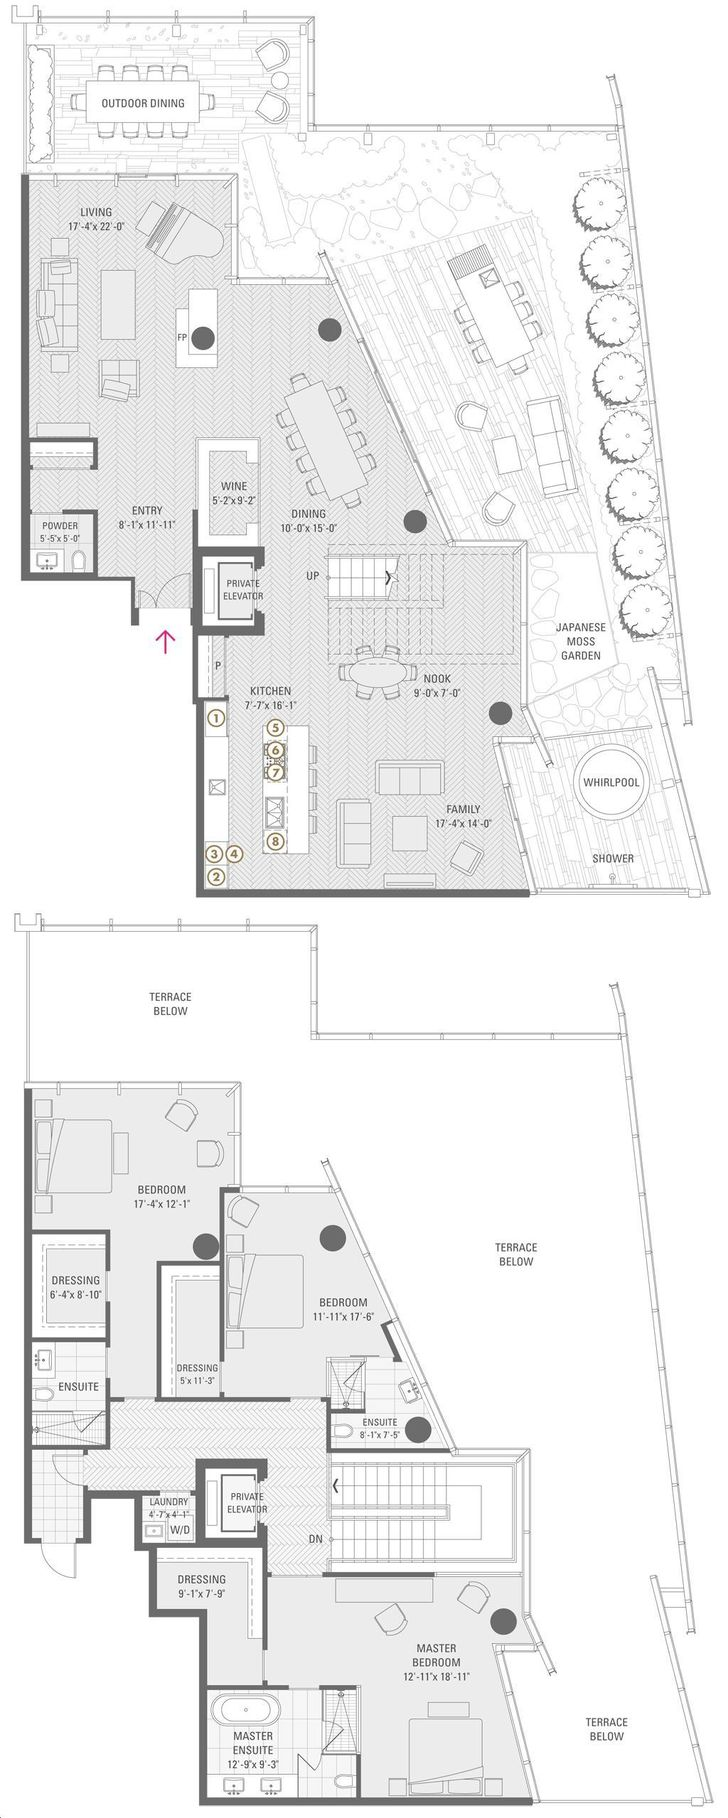 shangri la condos by peterson group penthouse 01 lower floorplan